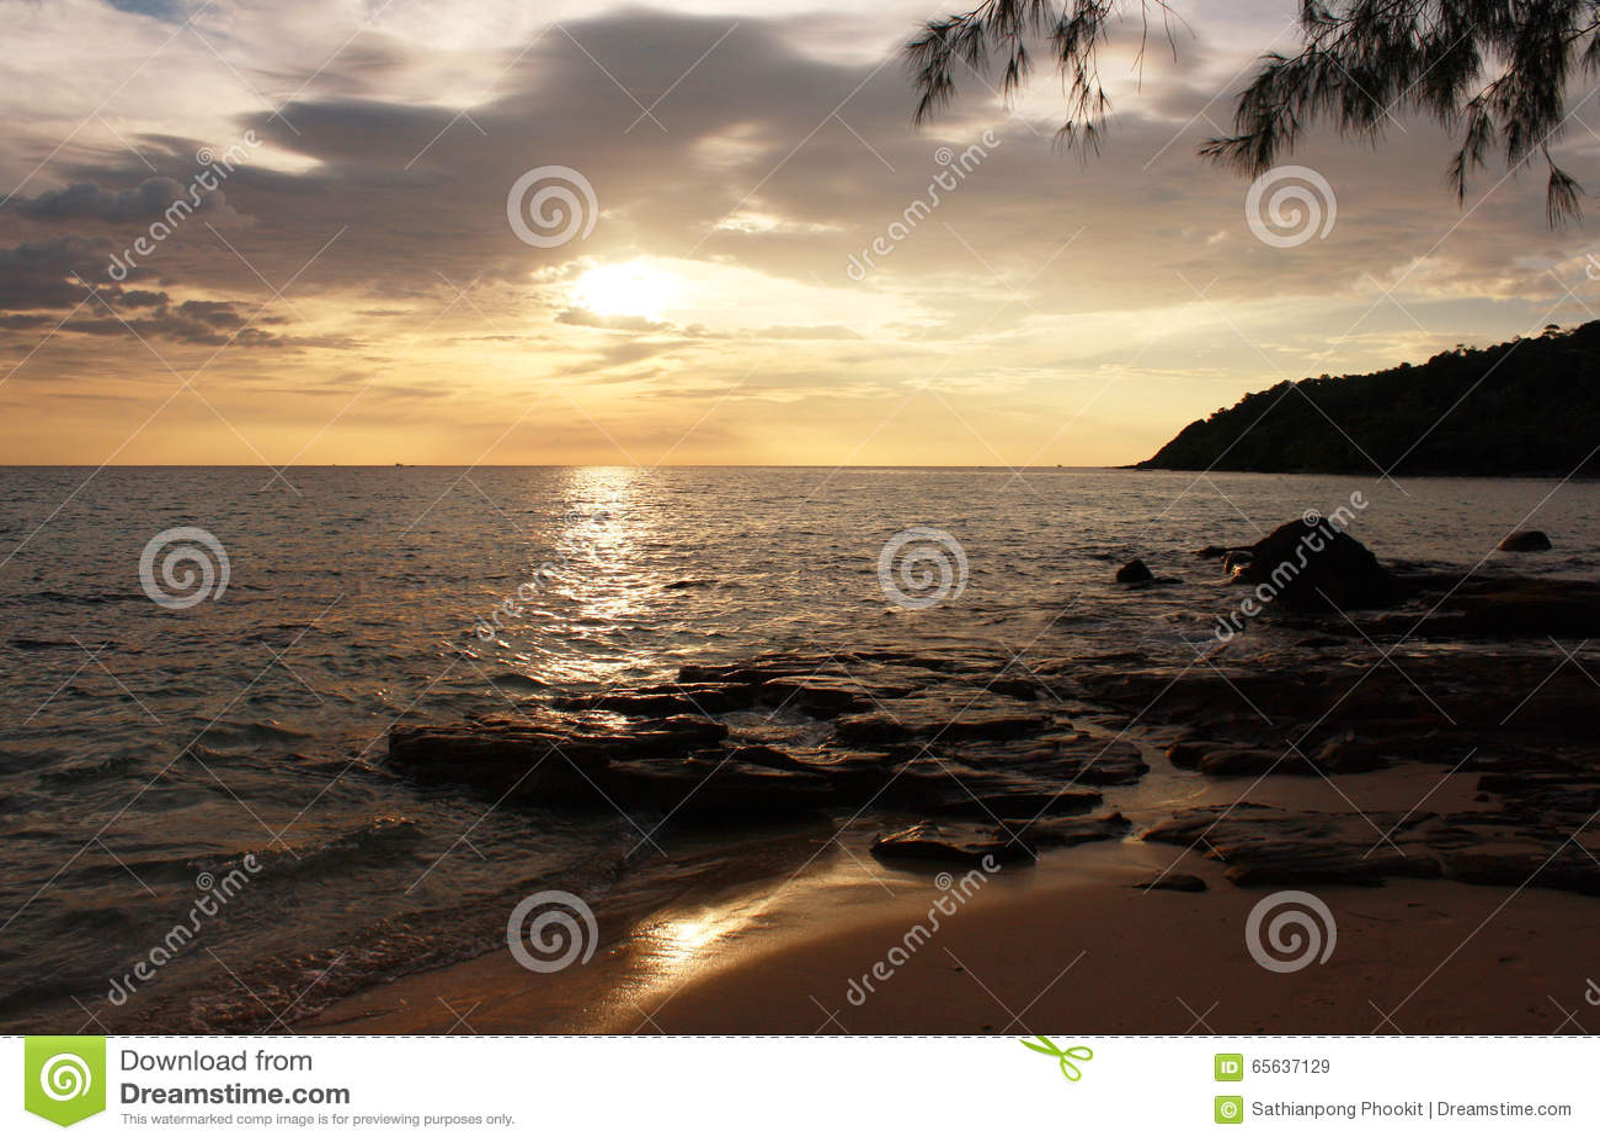 Île de Kood, Koh Kood, Trat, Thaïlande